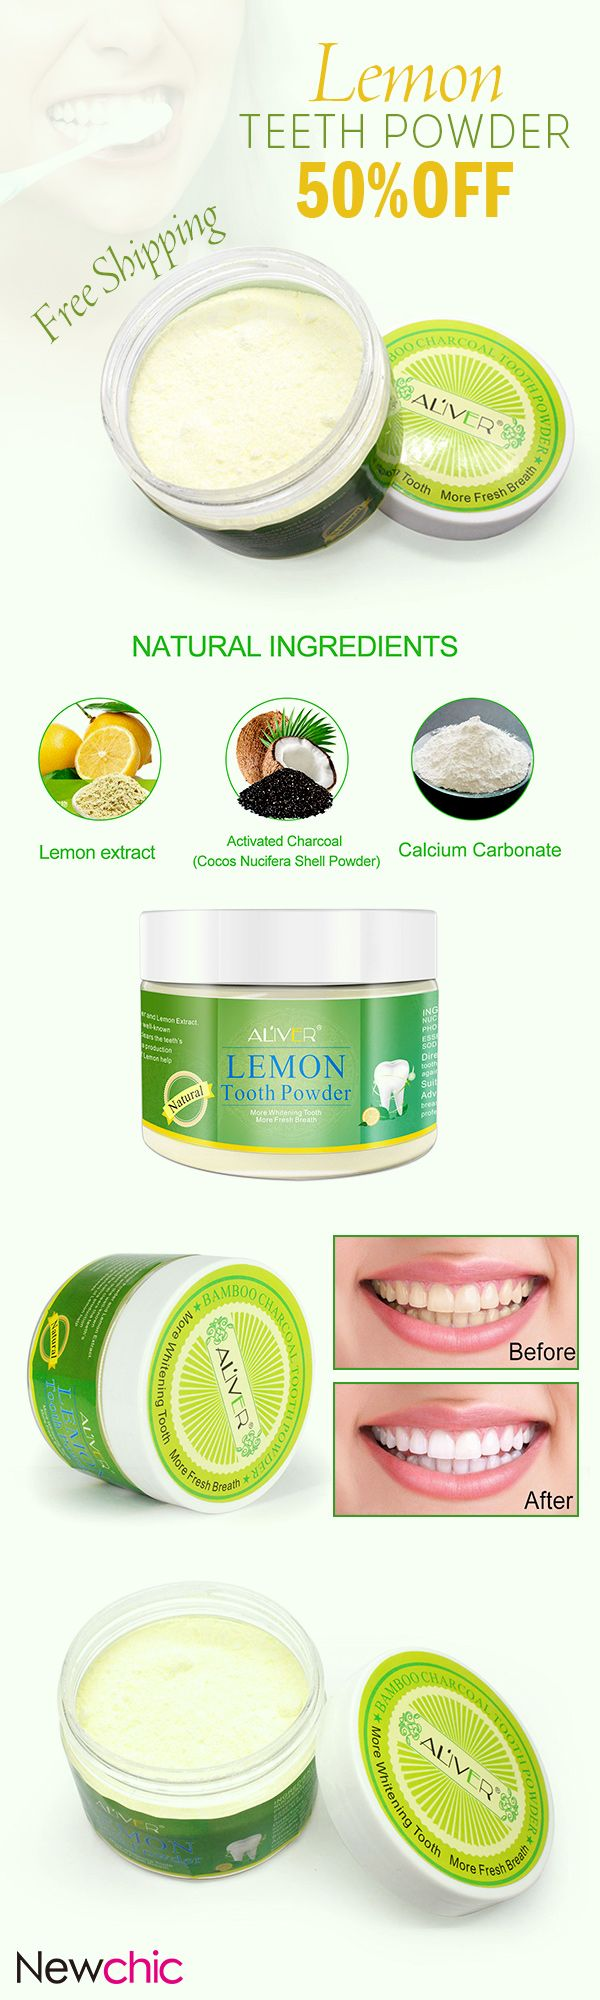 [Newchic Online Shopping] 50%OFF Lemon Teeth Powder